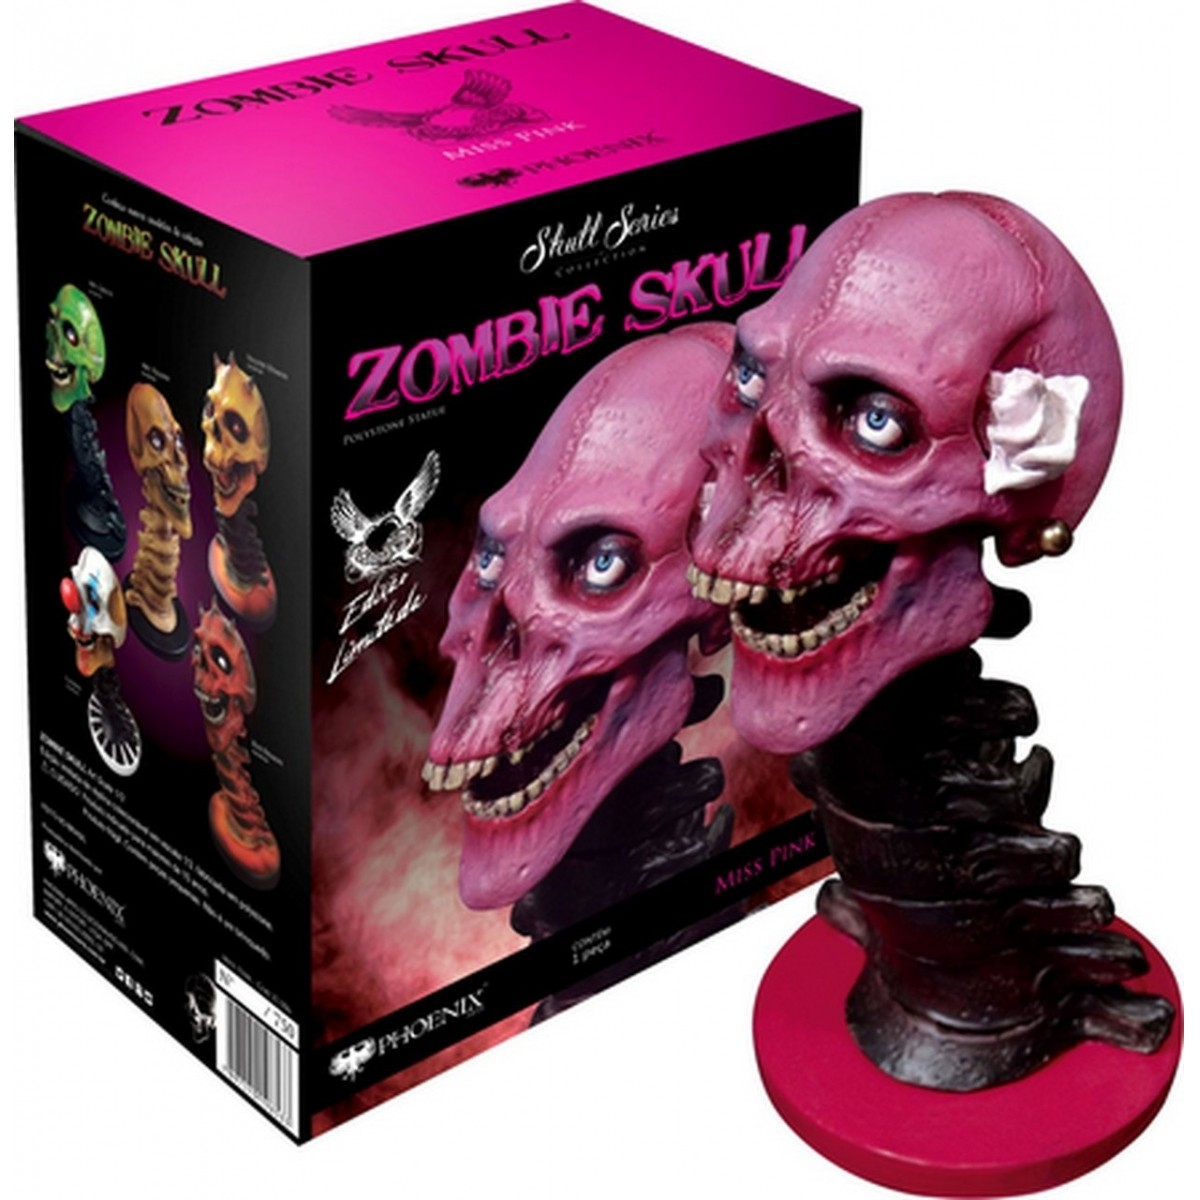 Estátua Zombie Skull Ms Pink: Art Scale Edição Limitada Escala 1/3 - Phoenix Arts